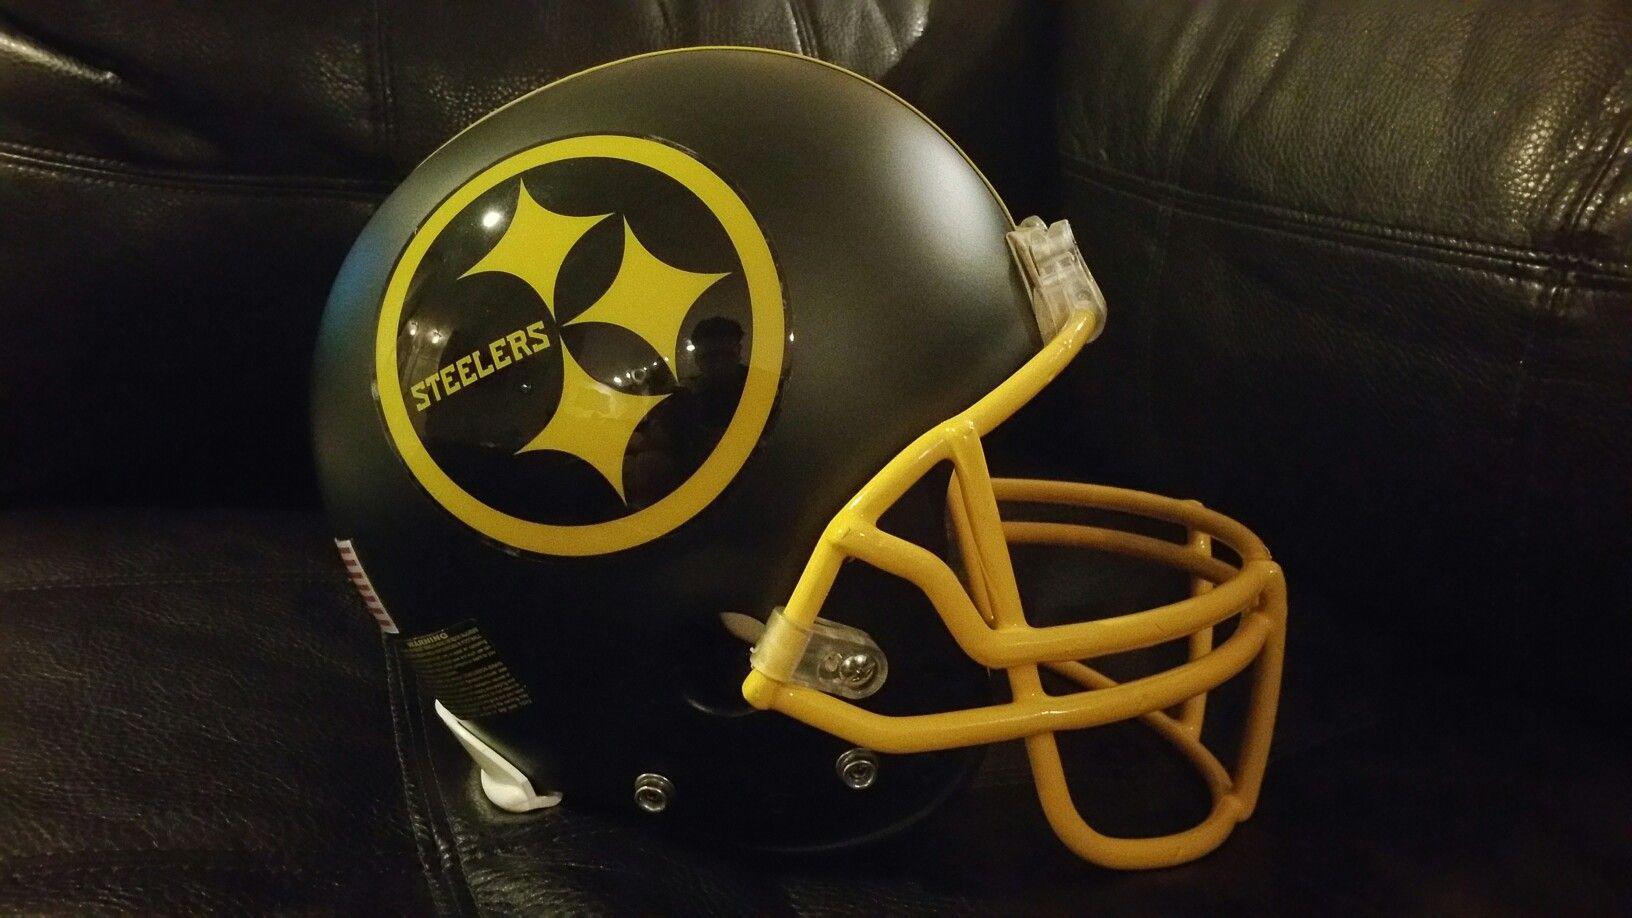 newest collection 8b086 31b3a Blackout Steelers helmet | Custom Football Helmets ...